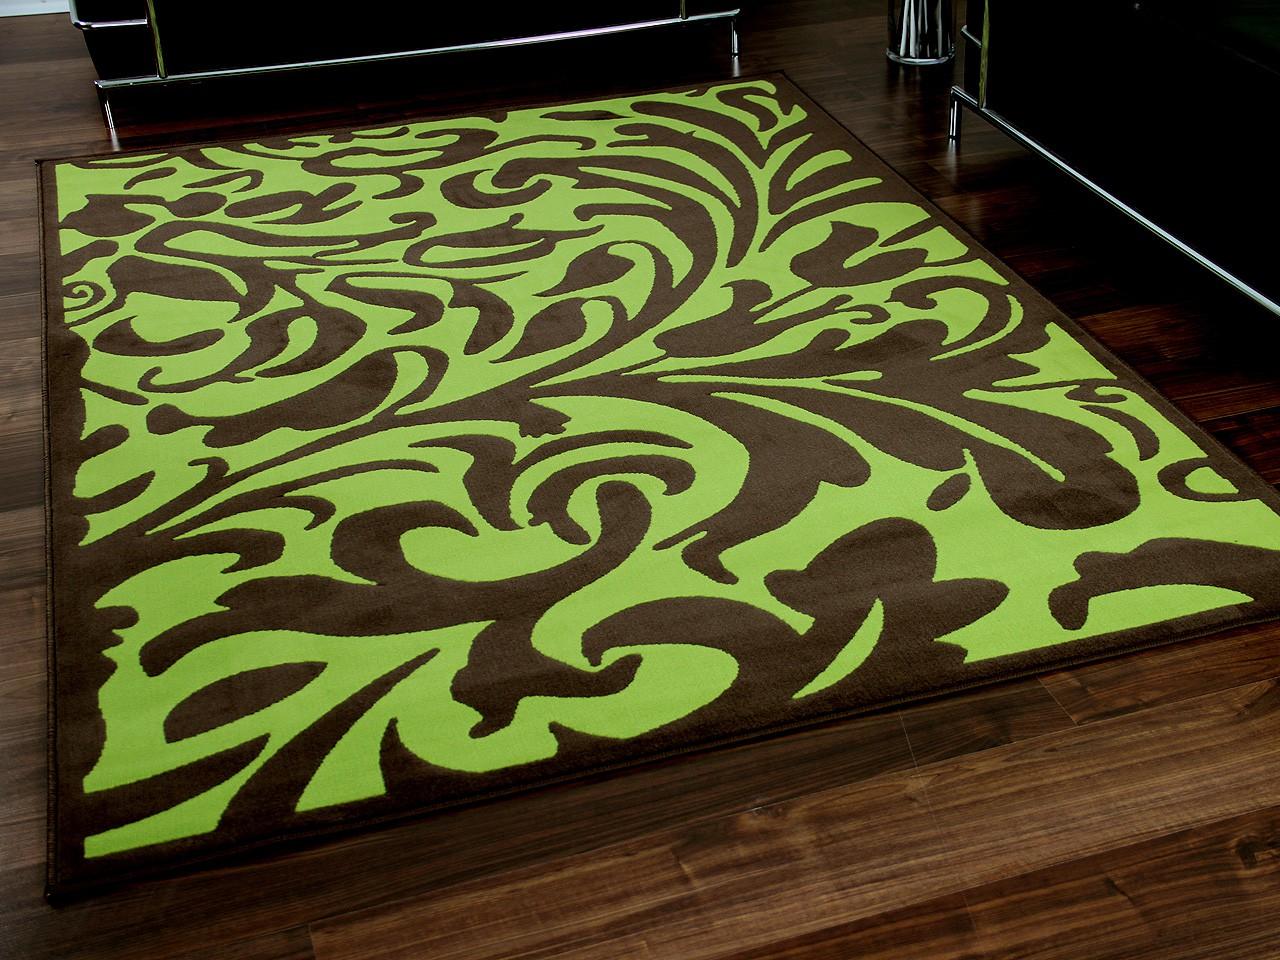 designer teppich passion braun gr n barock teppiche designerteppiche passion teppiche. Black Bedroom Furniture Sets. Home Design Ideas